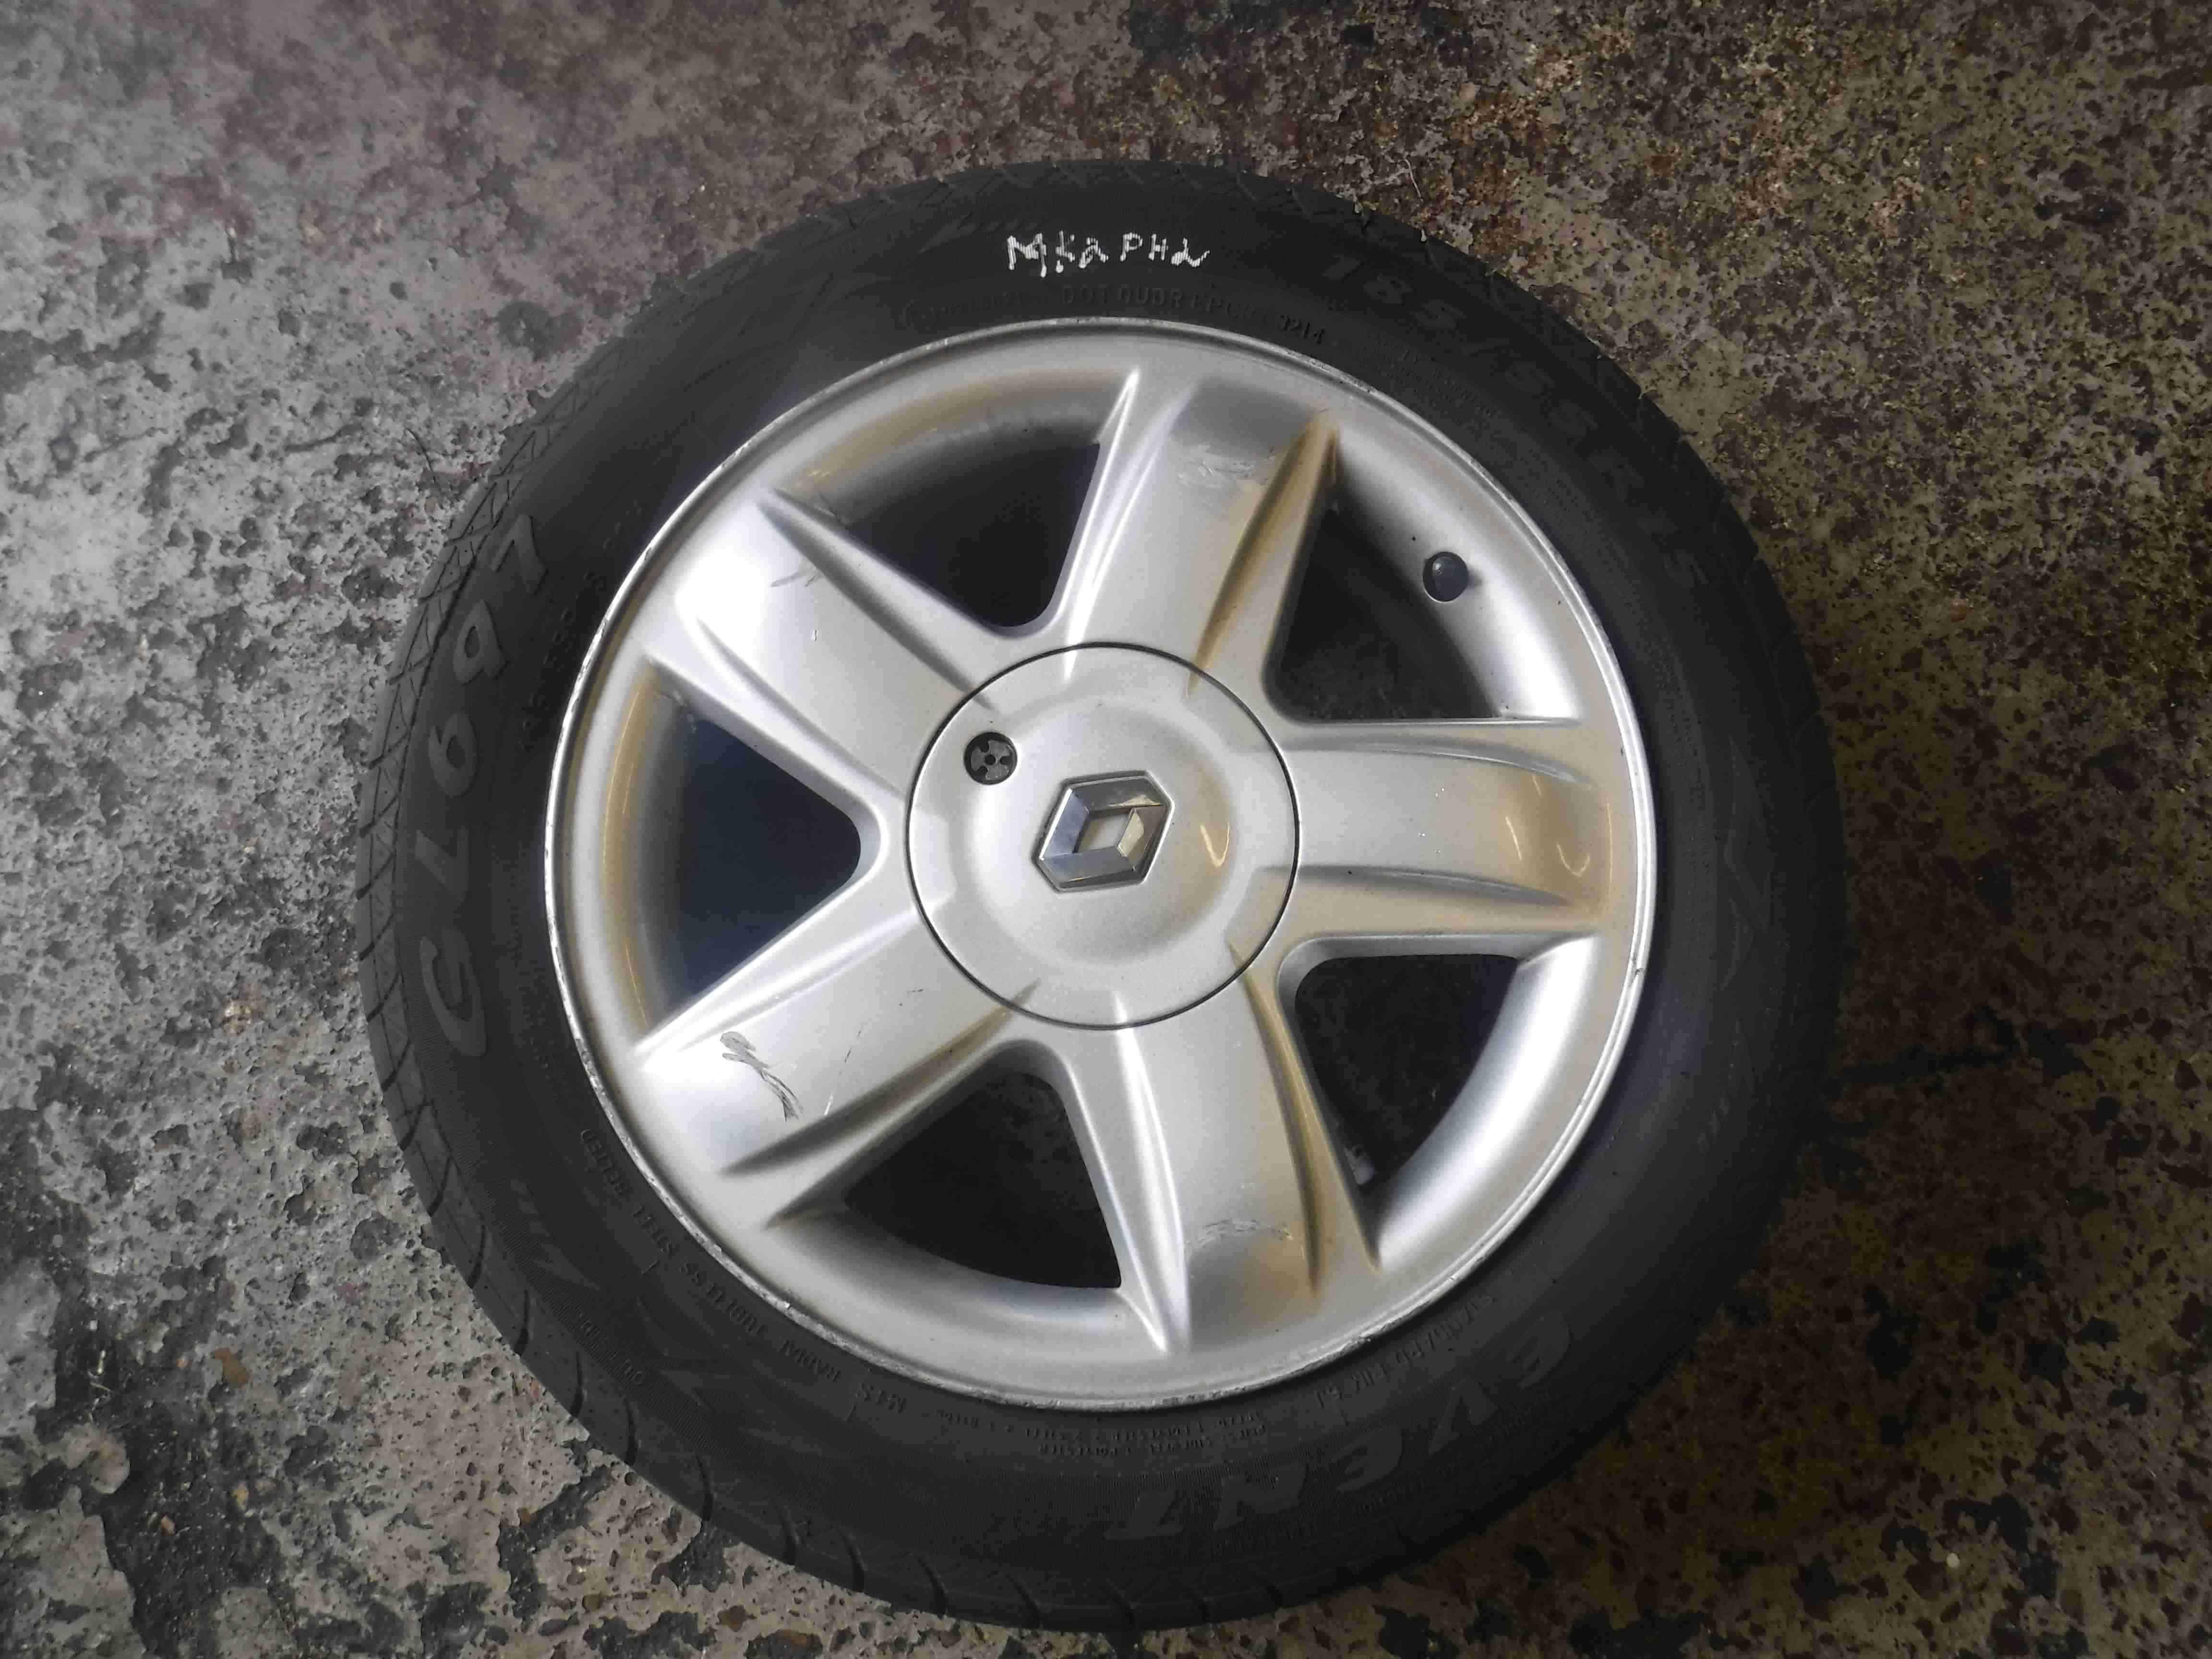 Renault Clio MK2 2001-2006 Dynamique Alloy Wheel + Tyre 185 55 15 7mm 3/5